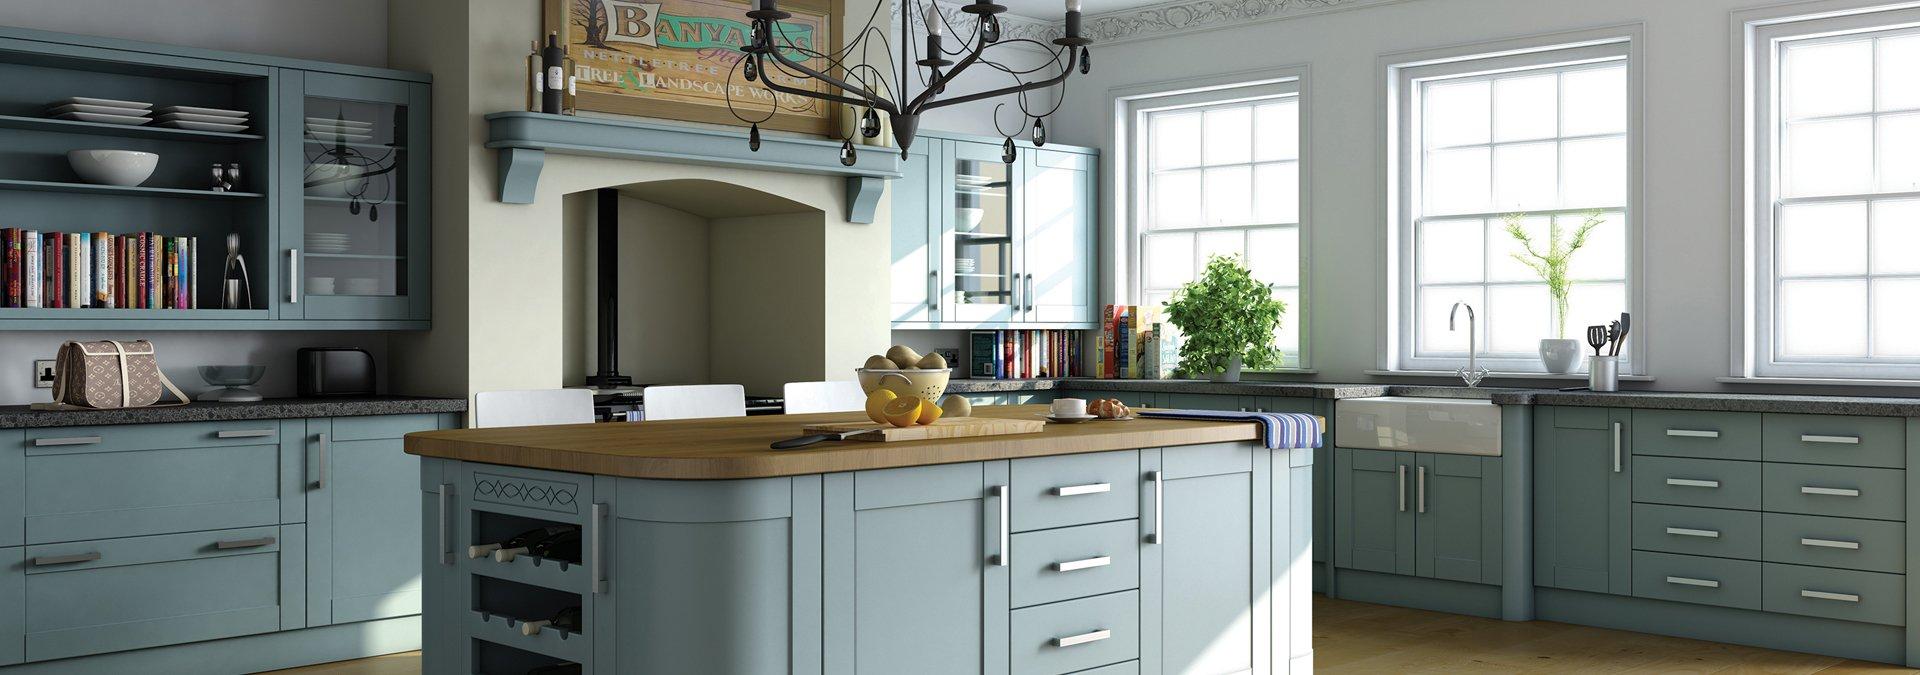 Replacement Kitchen Cabinet Doors Drawers Amp Worktops Rkd